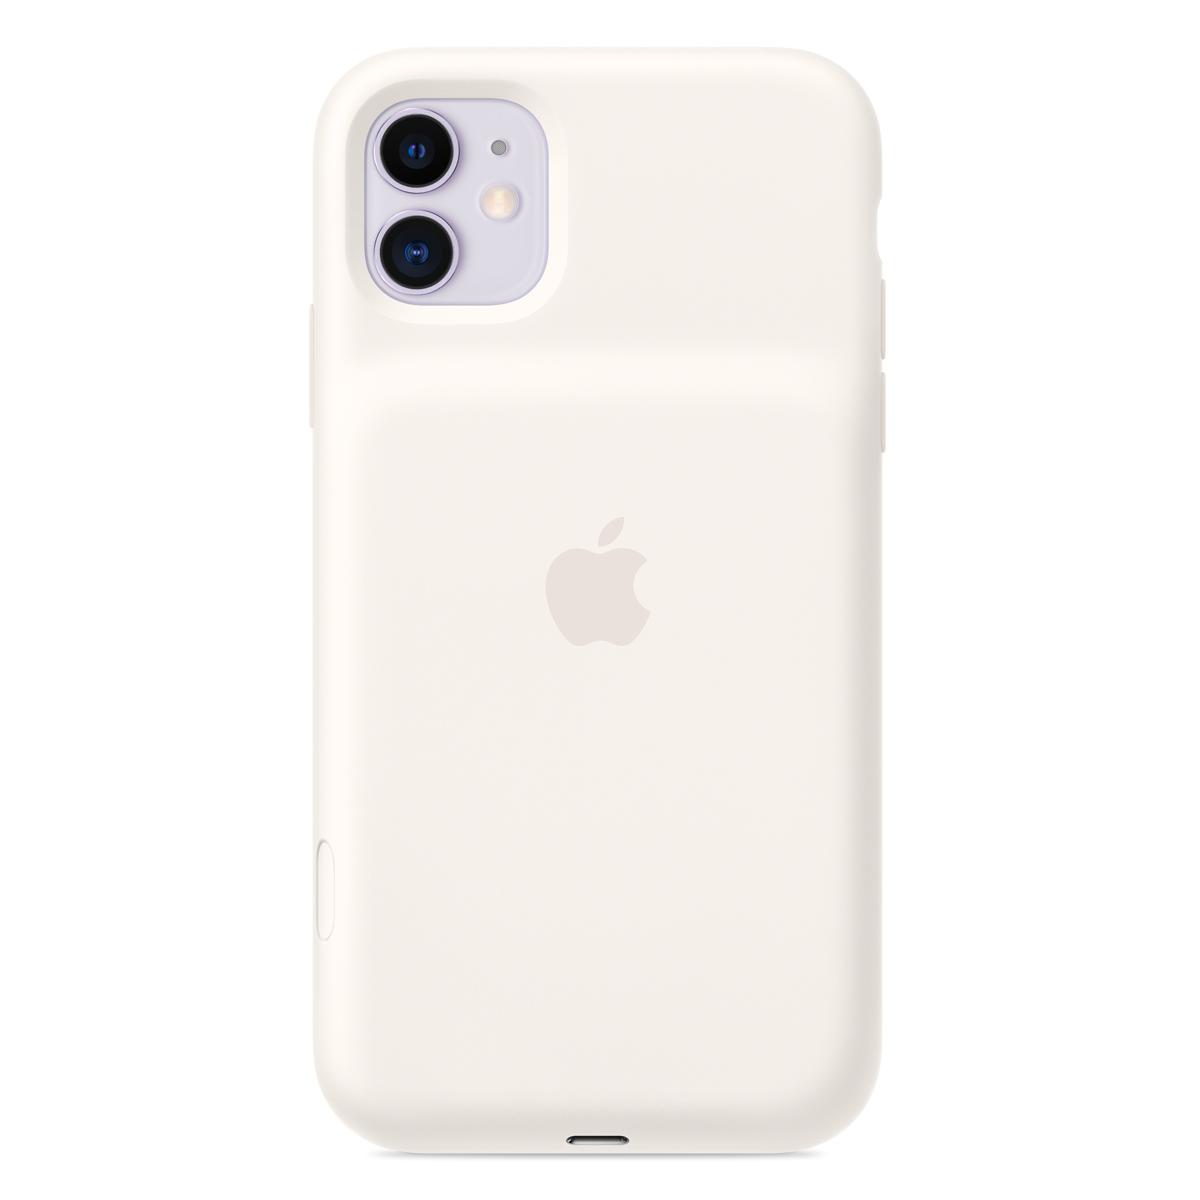 iPhone 11/11 Pro/11 Pro Max用の「Smart Battery Case」が登場! カメラボタンを新搭載